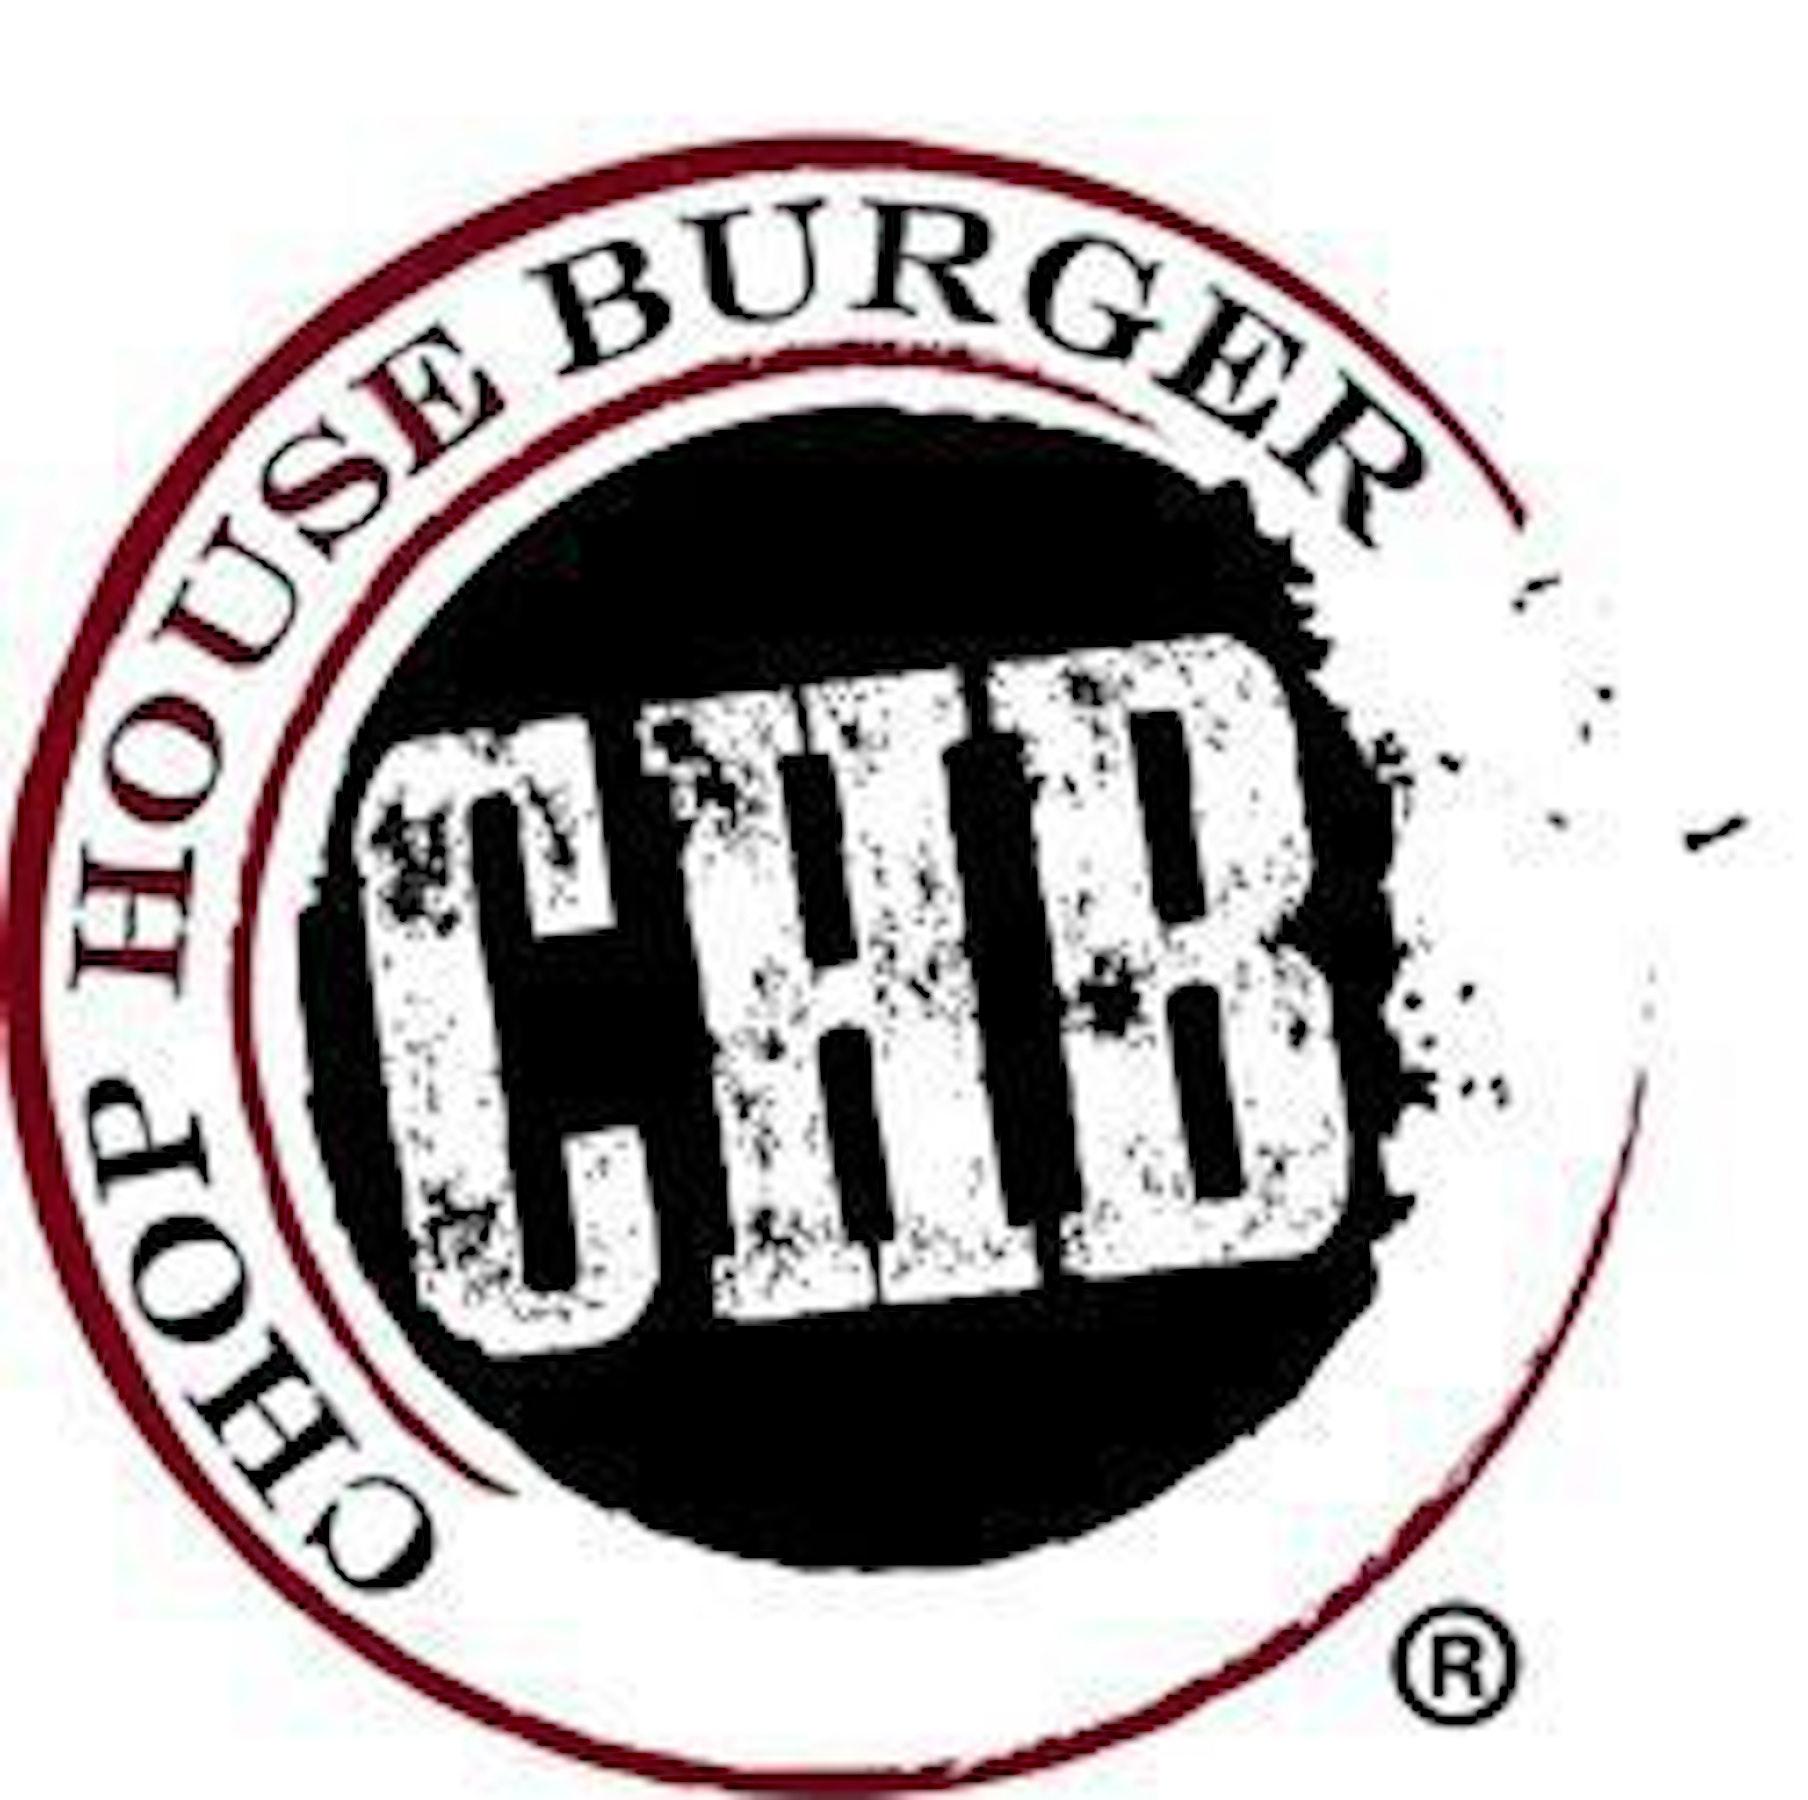 Chophouse Burger in Beyond Dallas